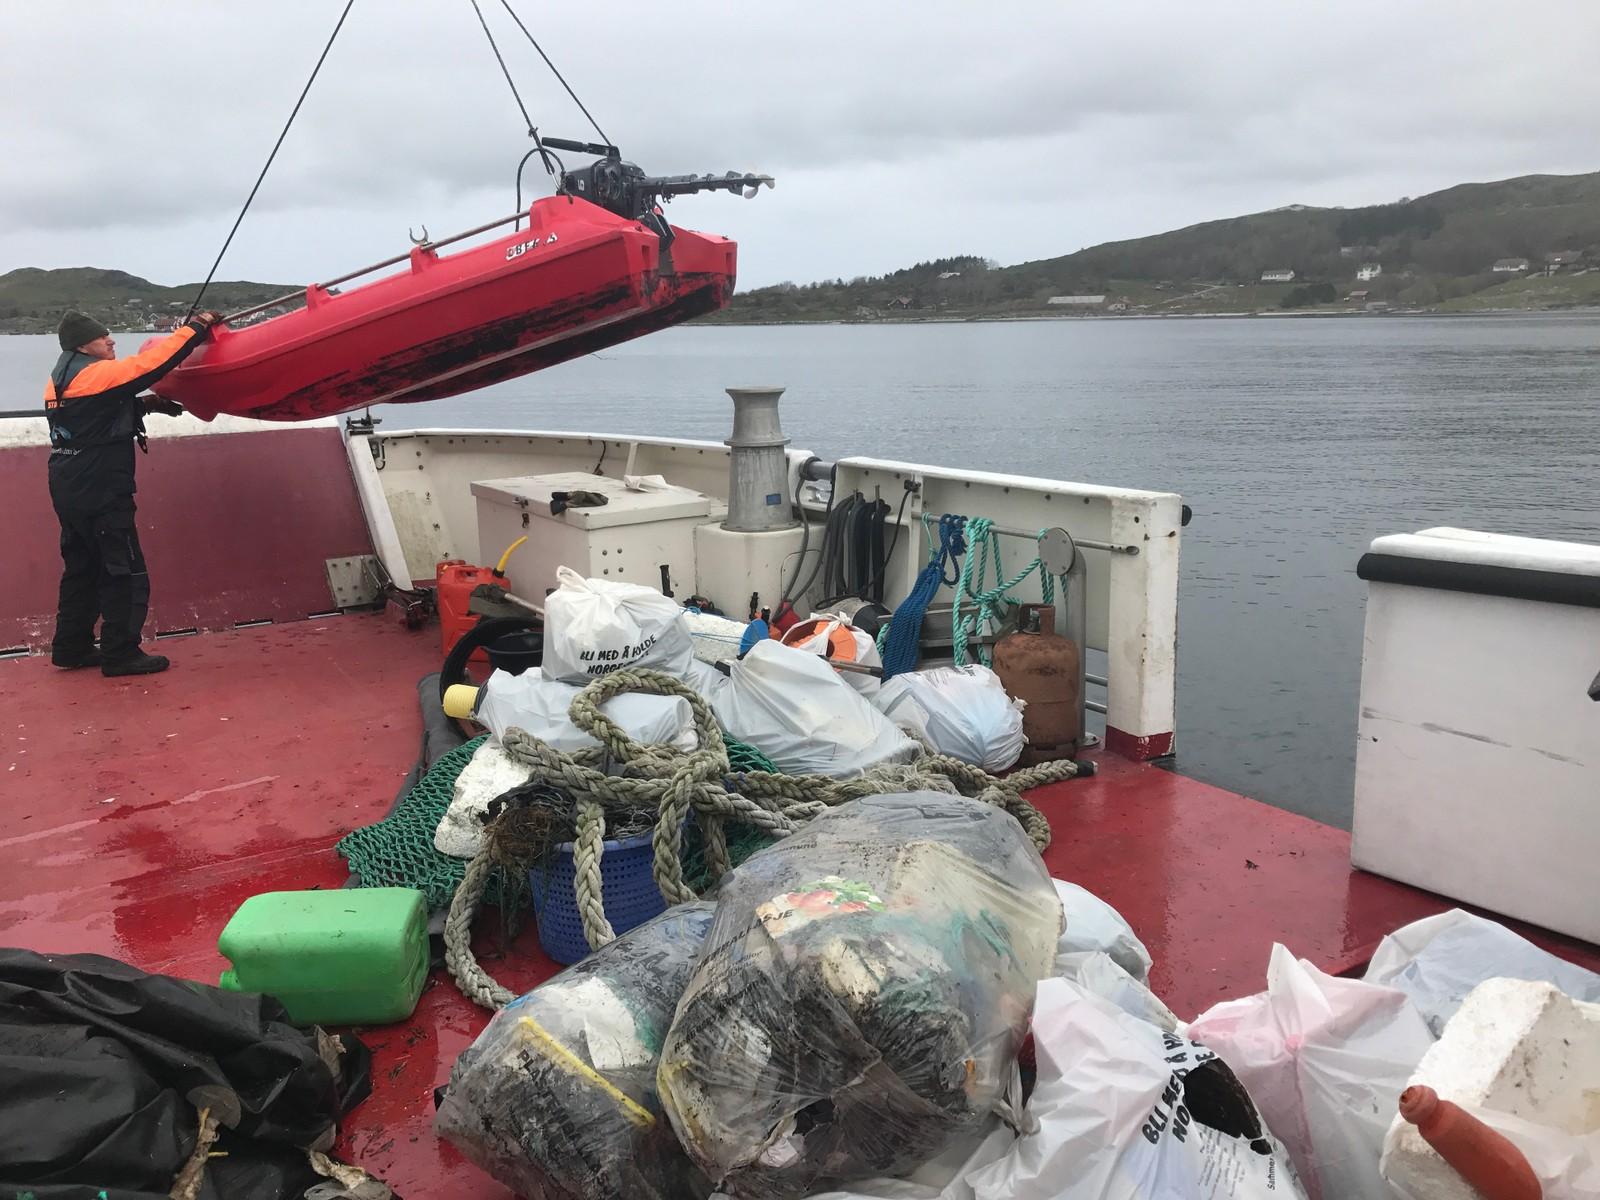 Frode Kvanvik og familien har funnet store mengder avfall i Knarravika på Mosterøy. Ryfylke Friluftsråd bidrar med henting.